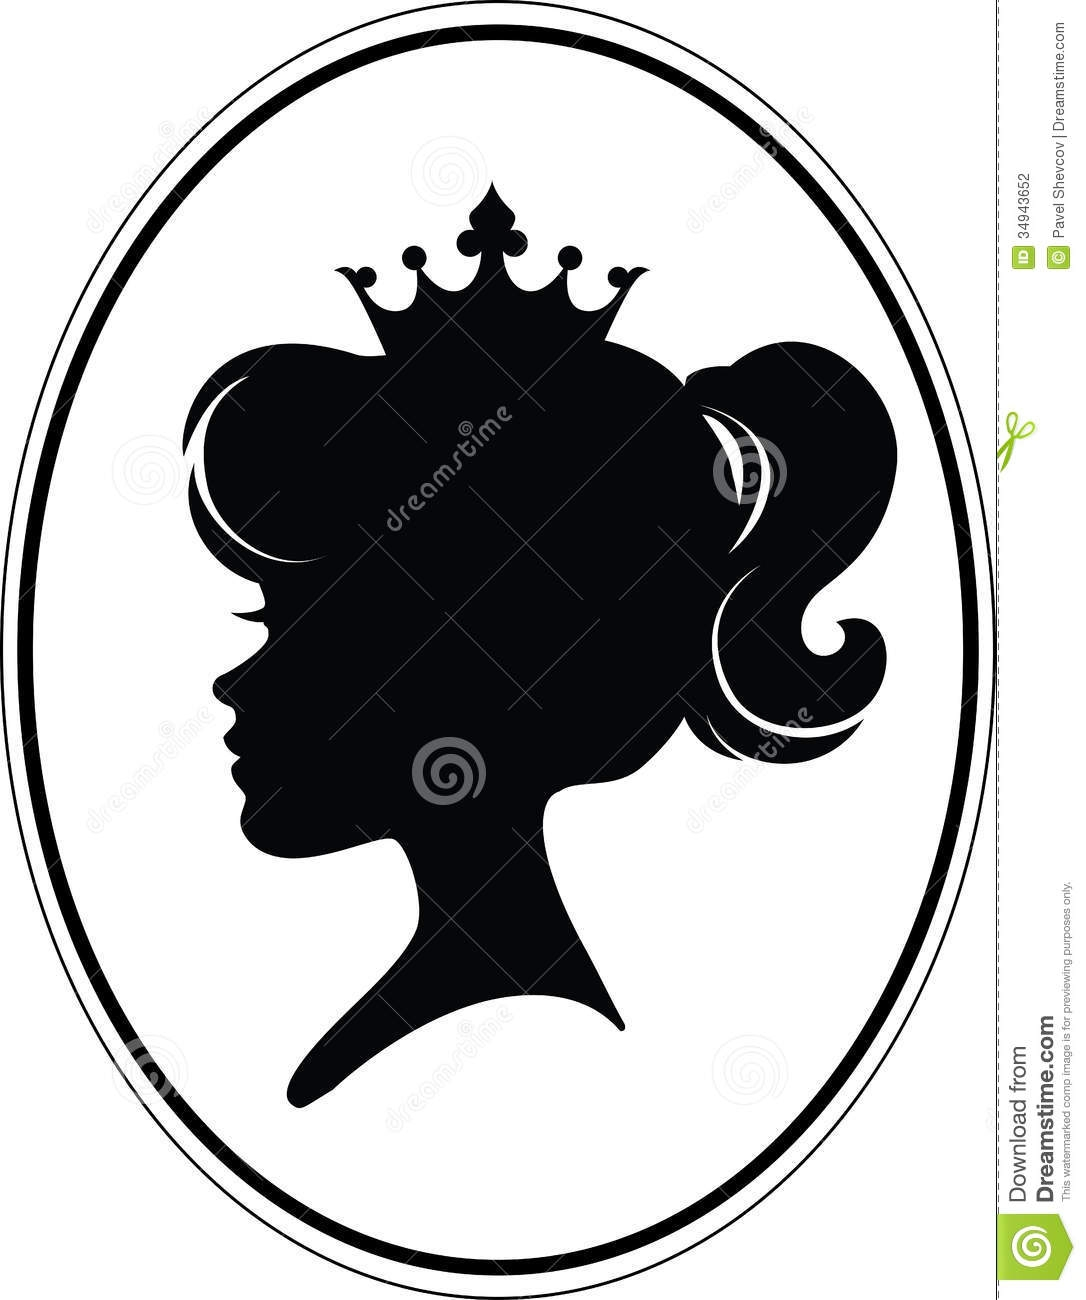 1086x1300 Disney Princess Silhouette Printables Belle 98005 Bitplanet